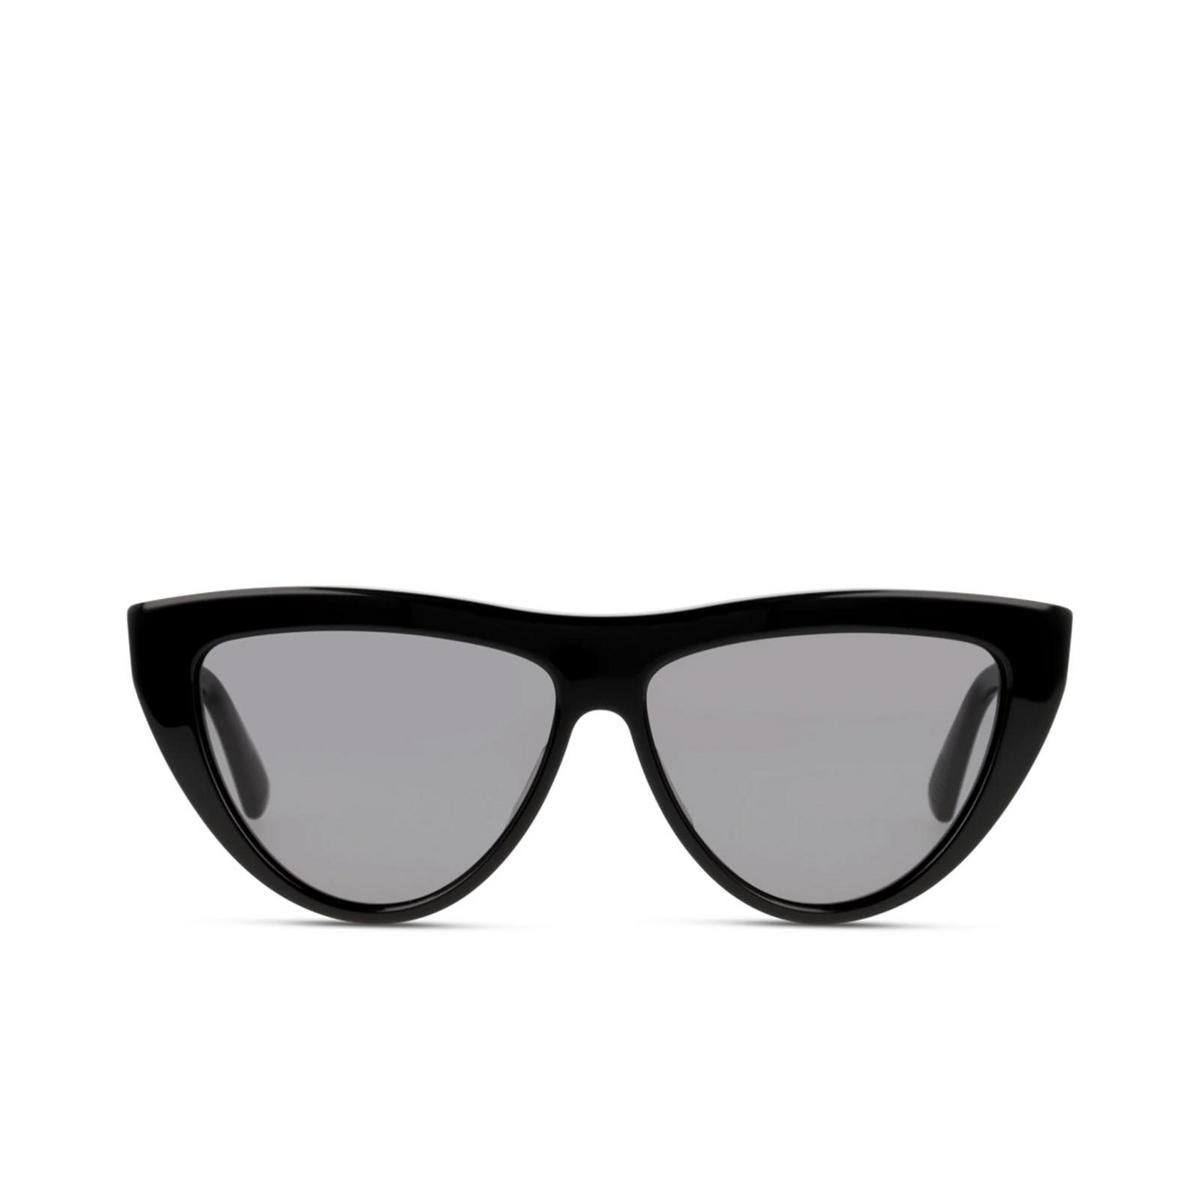 Bottega Veneta® Cat-eye Sunglasses: BV1018S color Black 001 - front view.